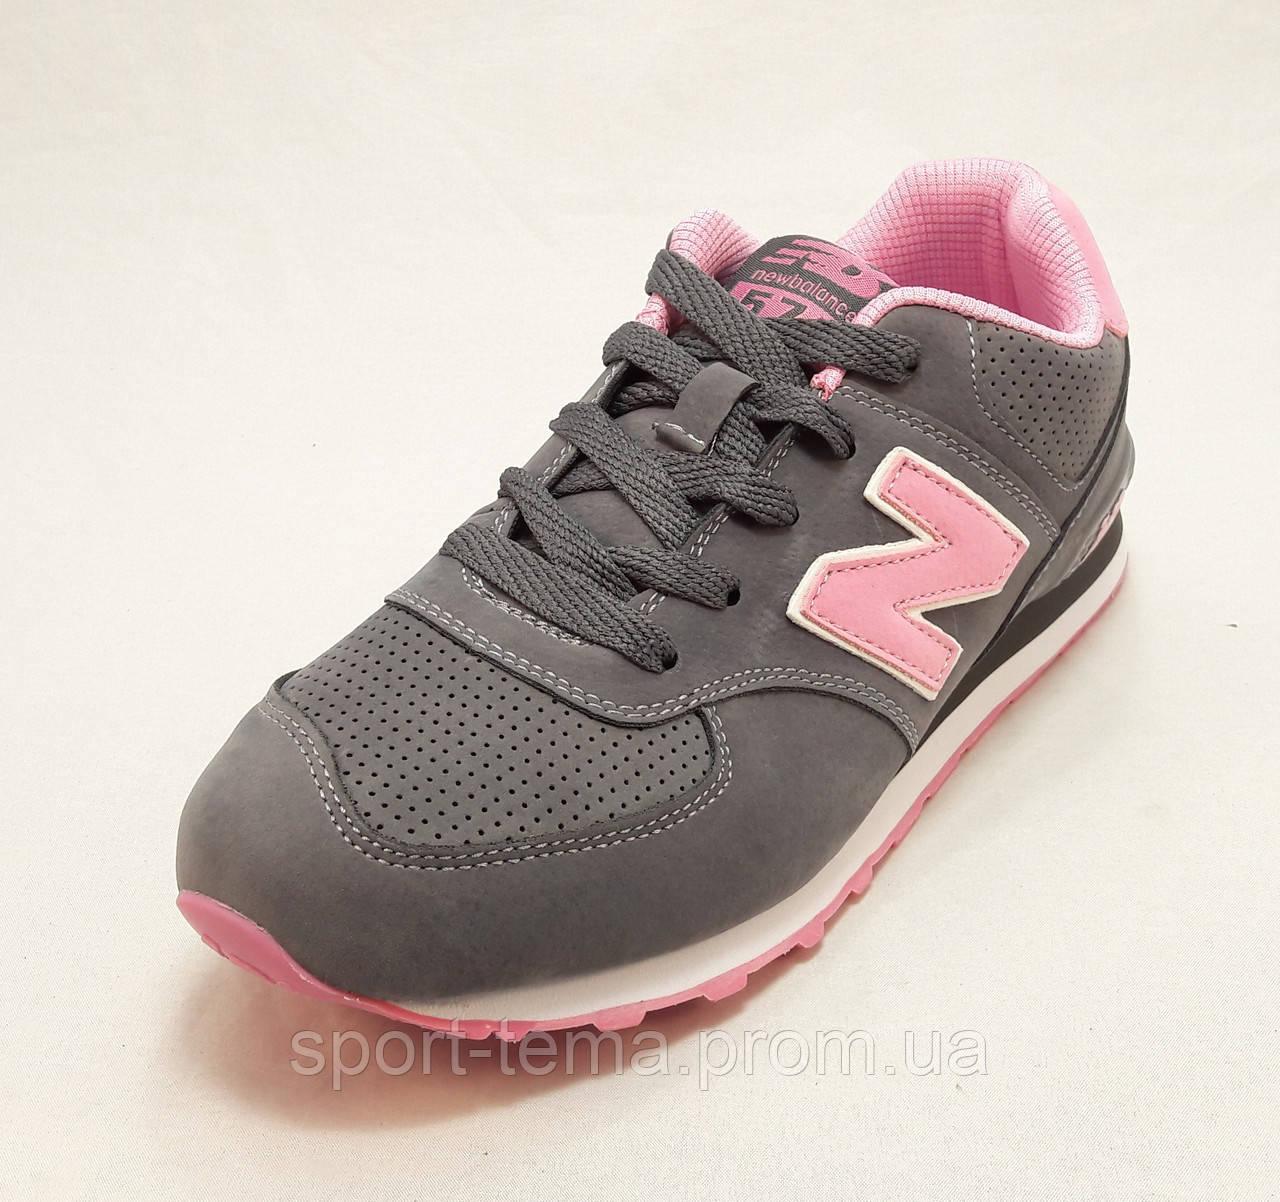 23e353aa04fa Кроссовки женские New Balance 574 замшевые серо-розовые (р.36,37,38,39,40)